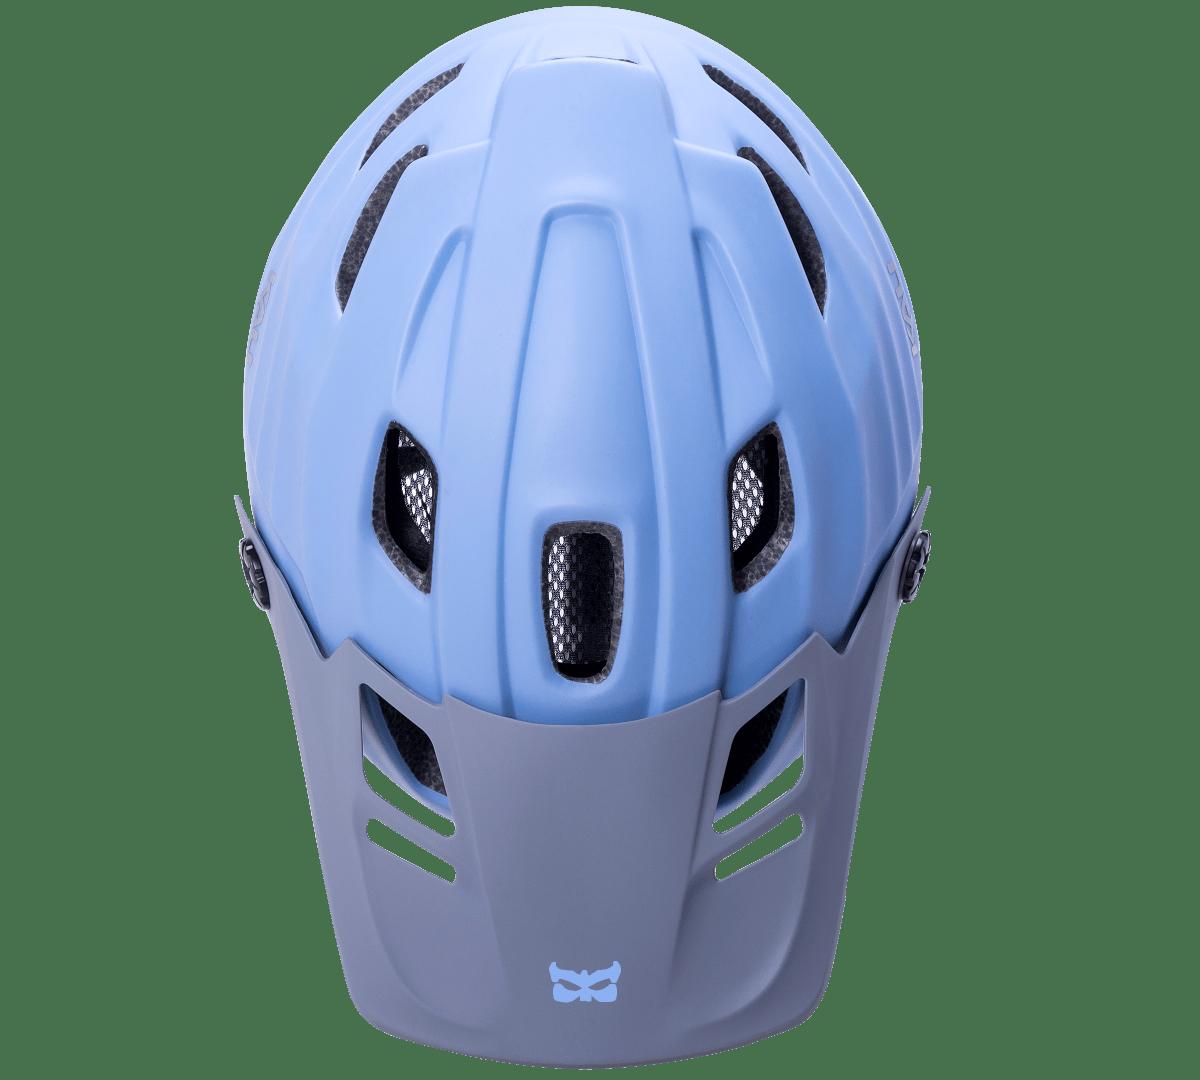 MAYA - Bike Helmets - Kali Protectives